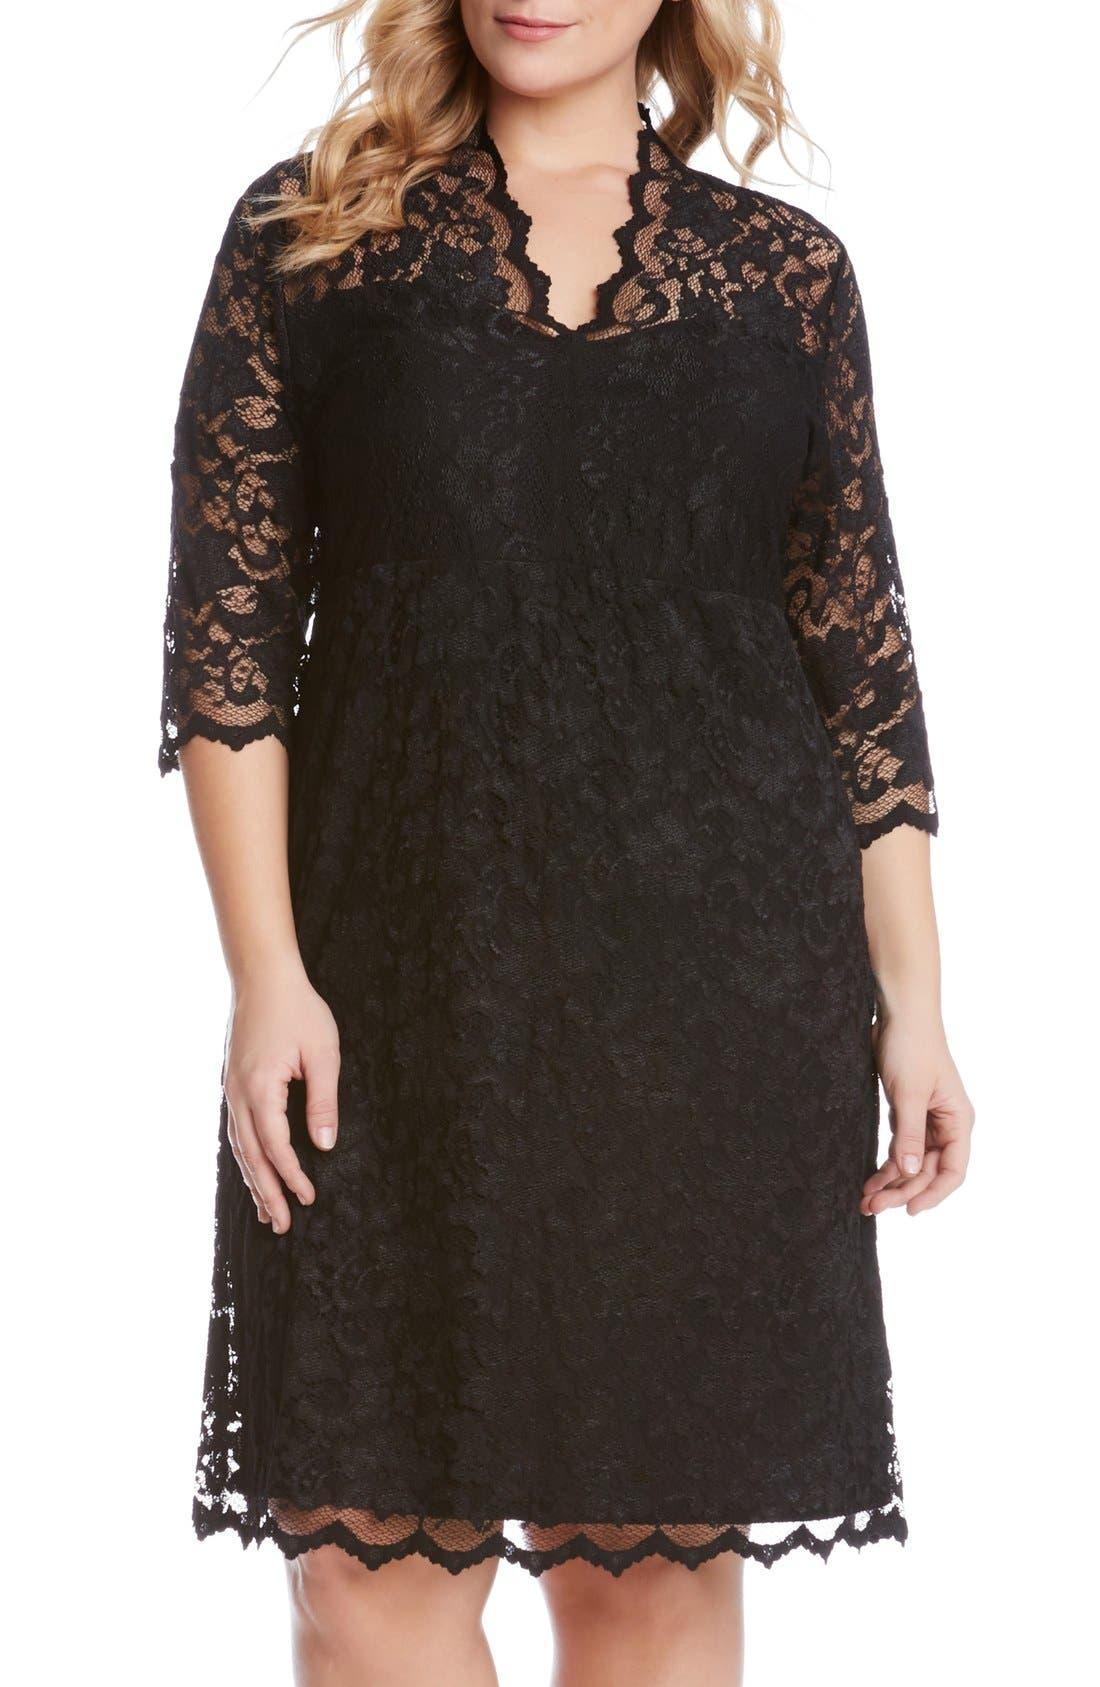 KAREN KANE Scalloped Stretch Lace Dress, Main, color, BLACK